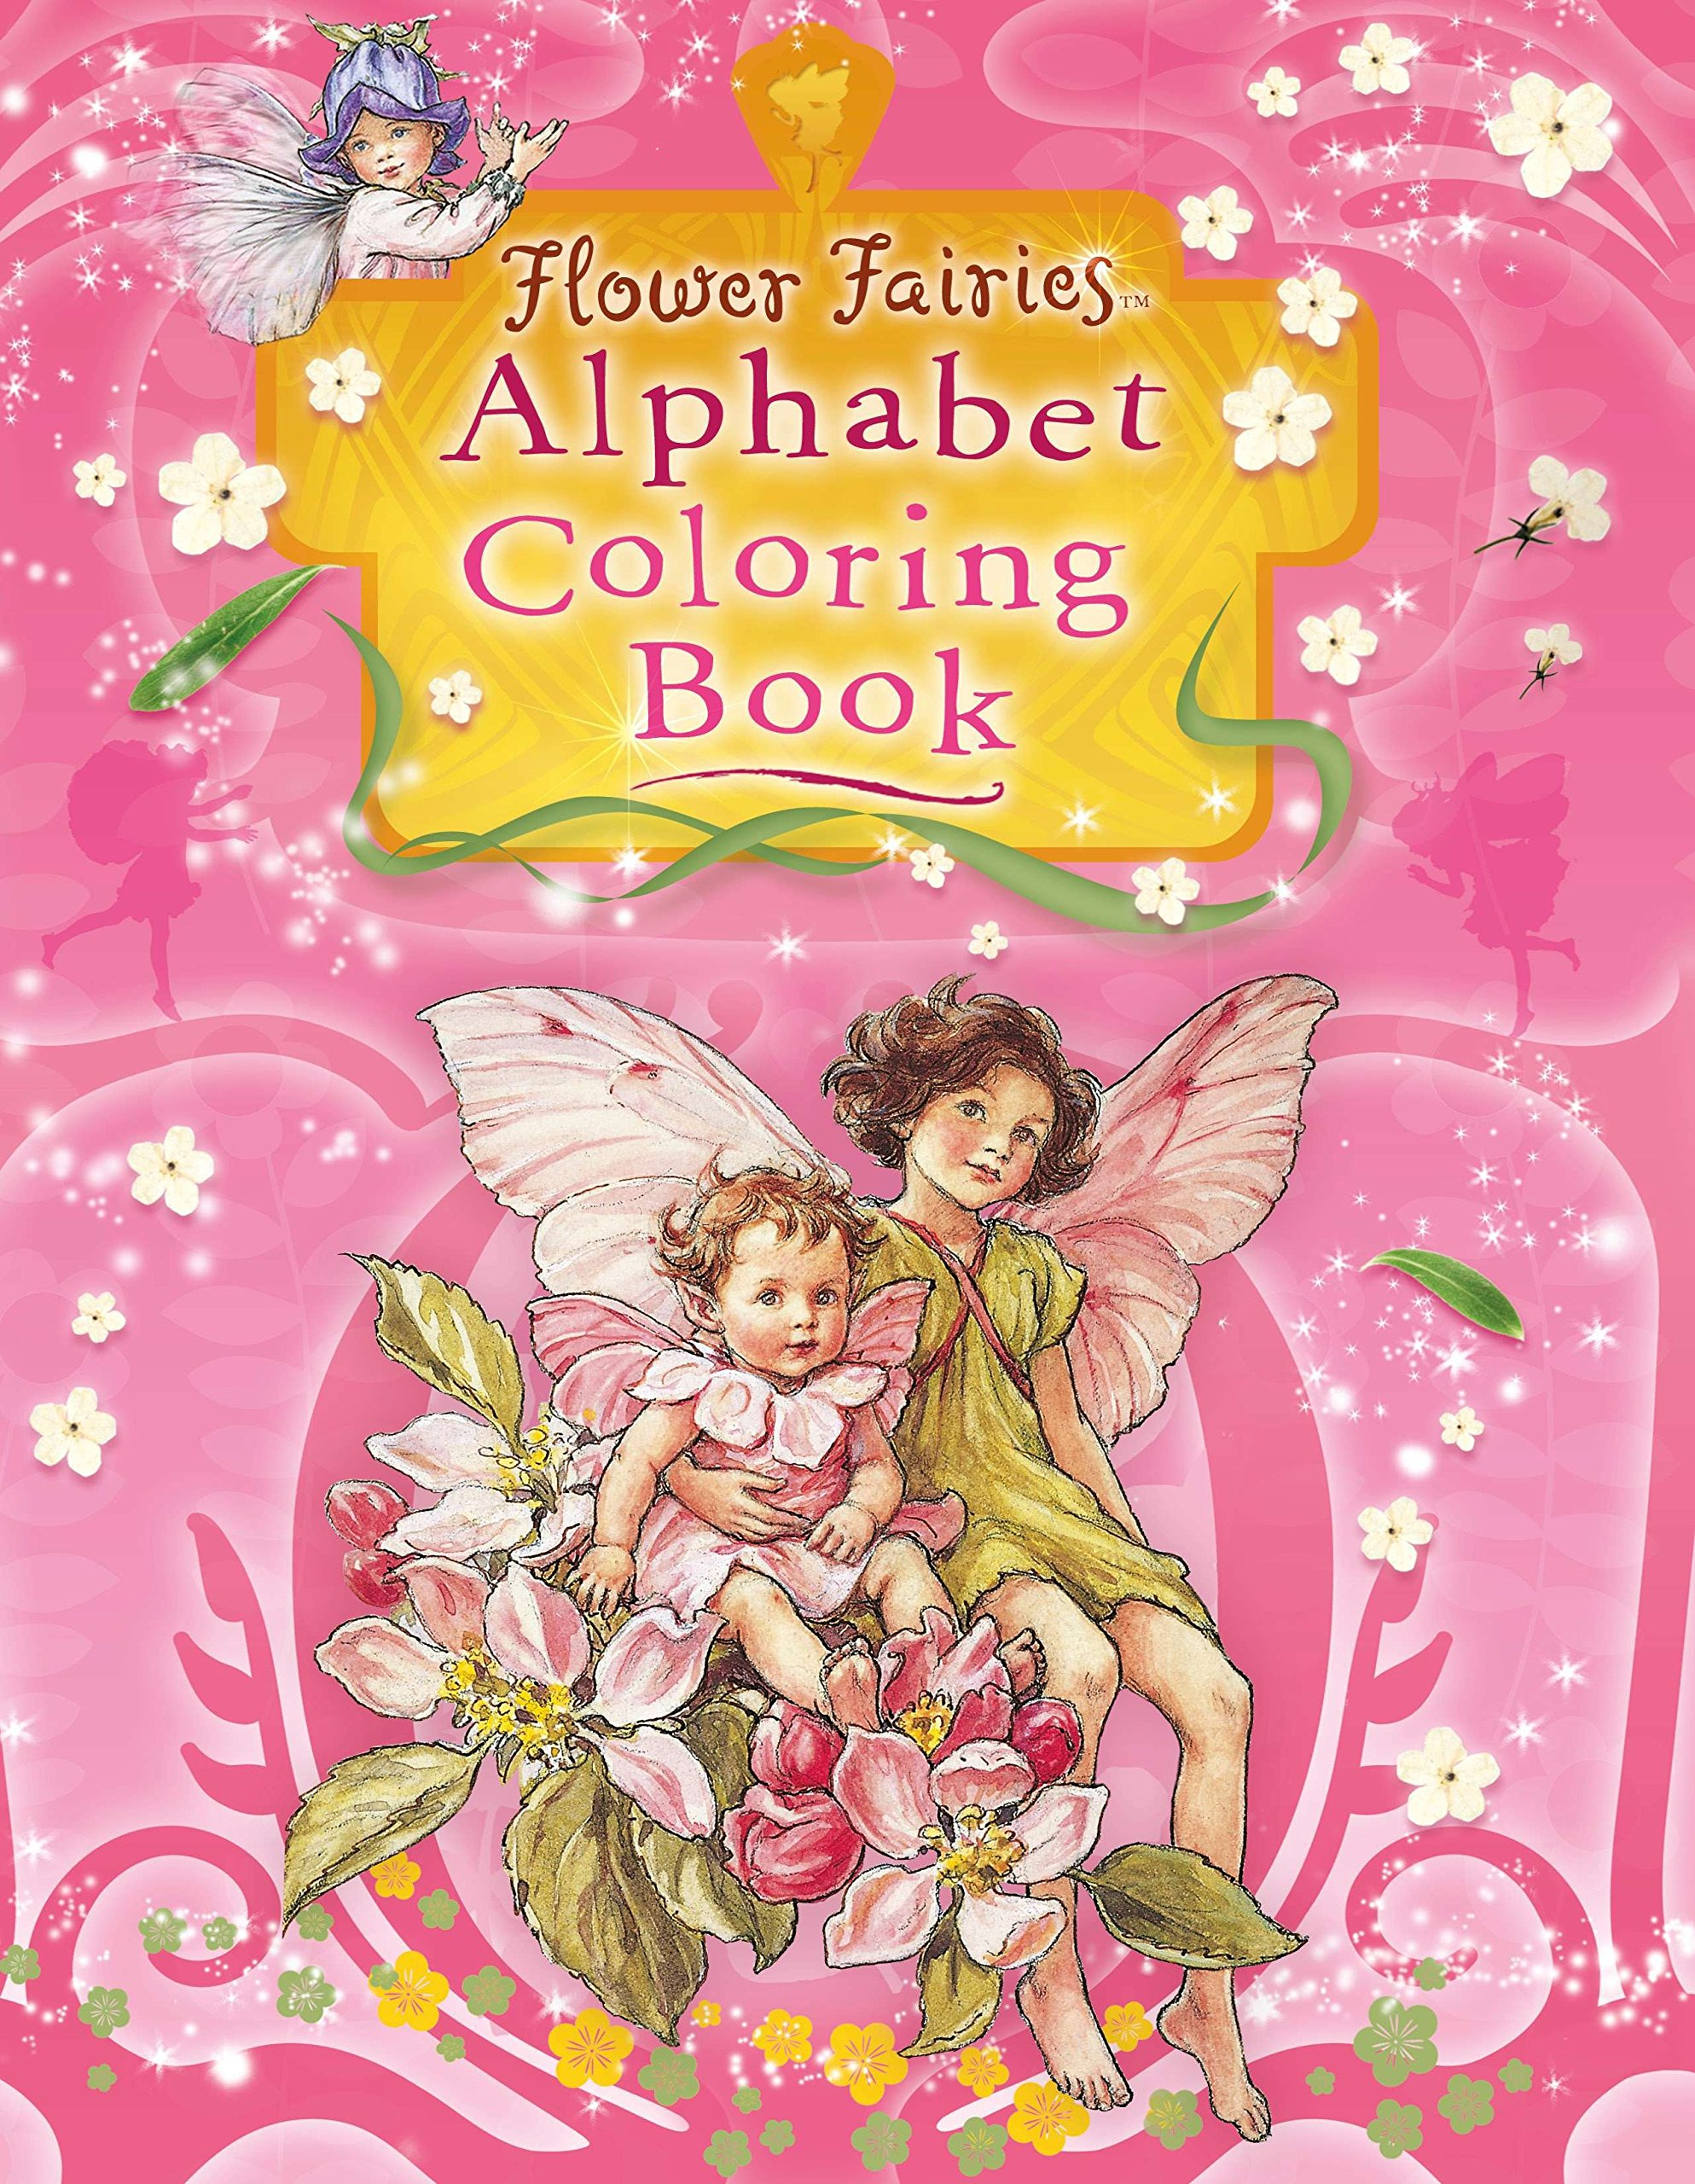 Amazon.com: Flower Fairies Alphabet Coloring Book (9780723264965 ...